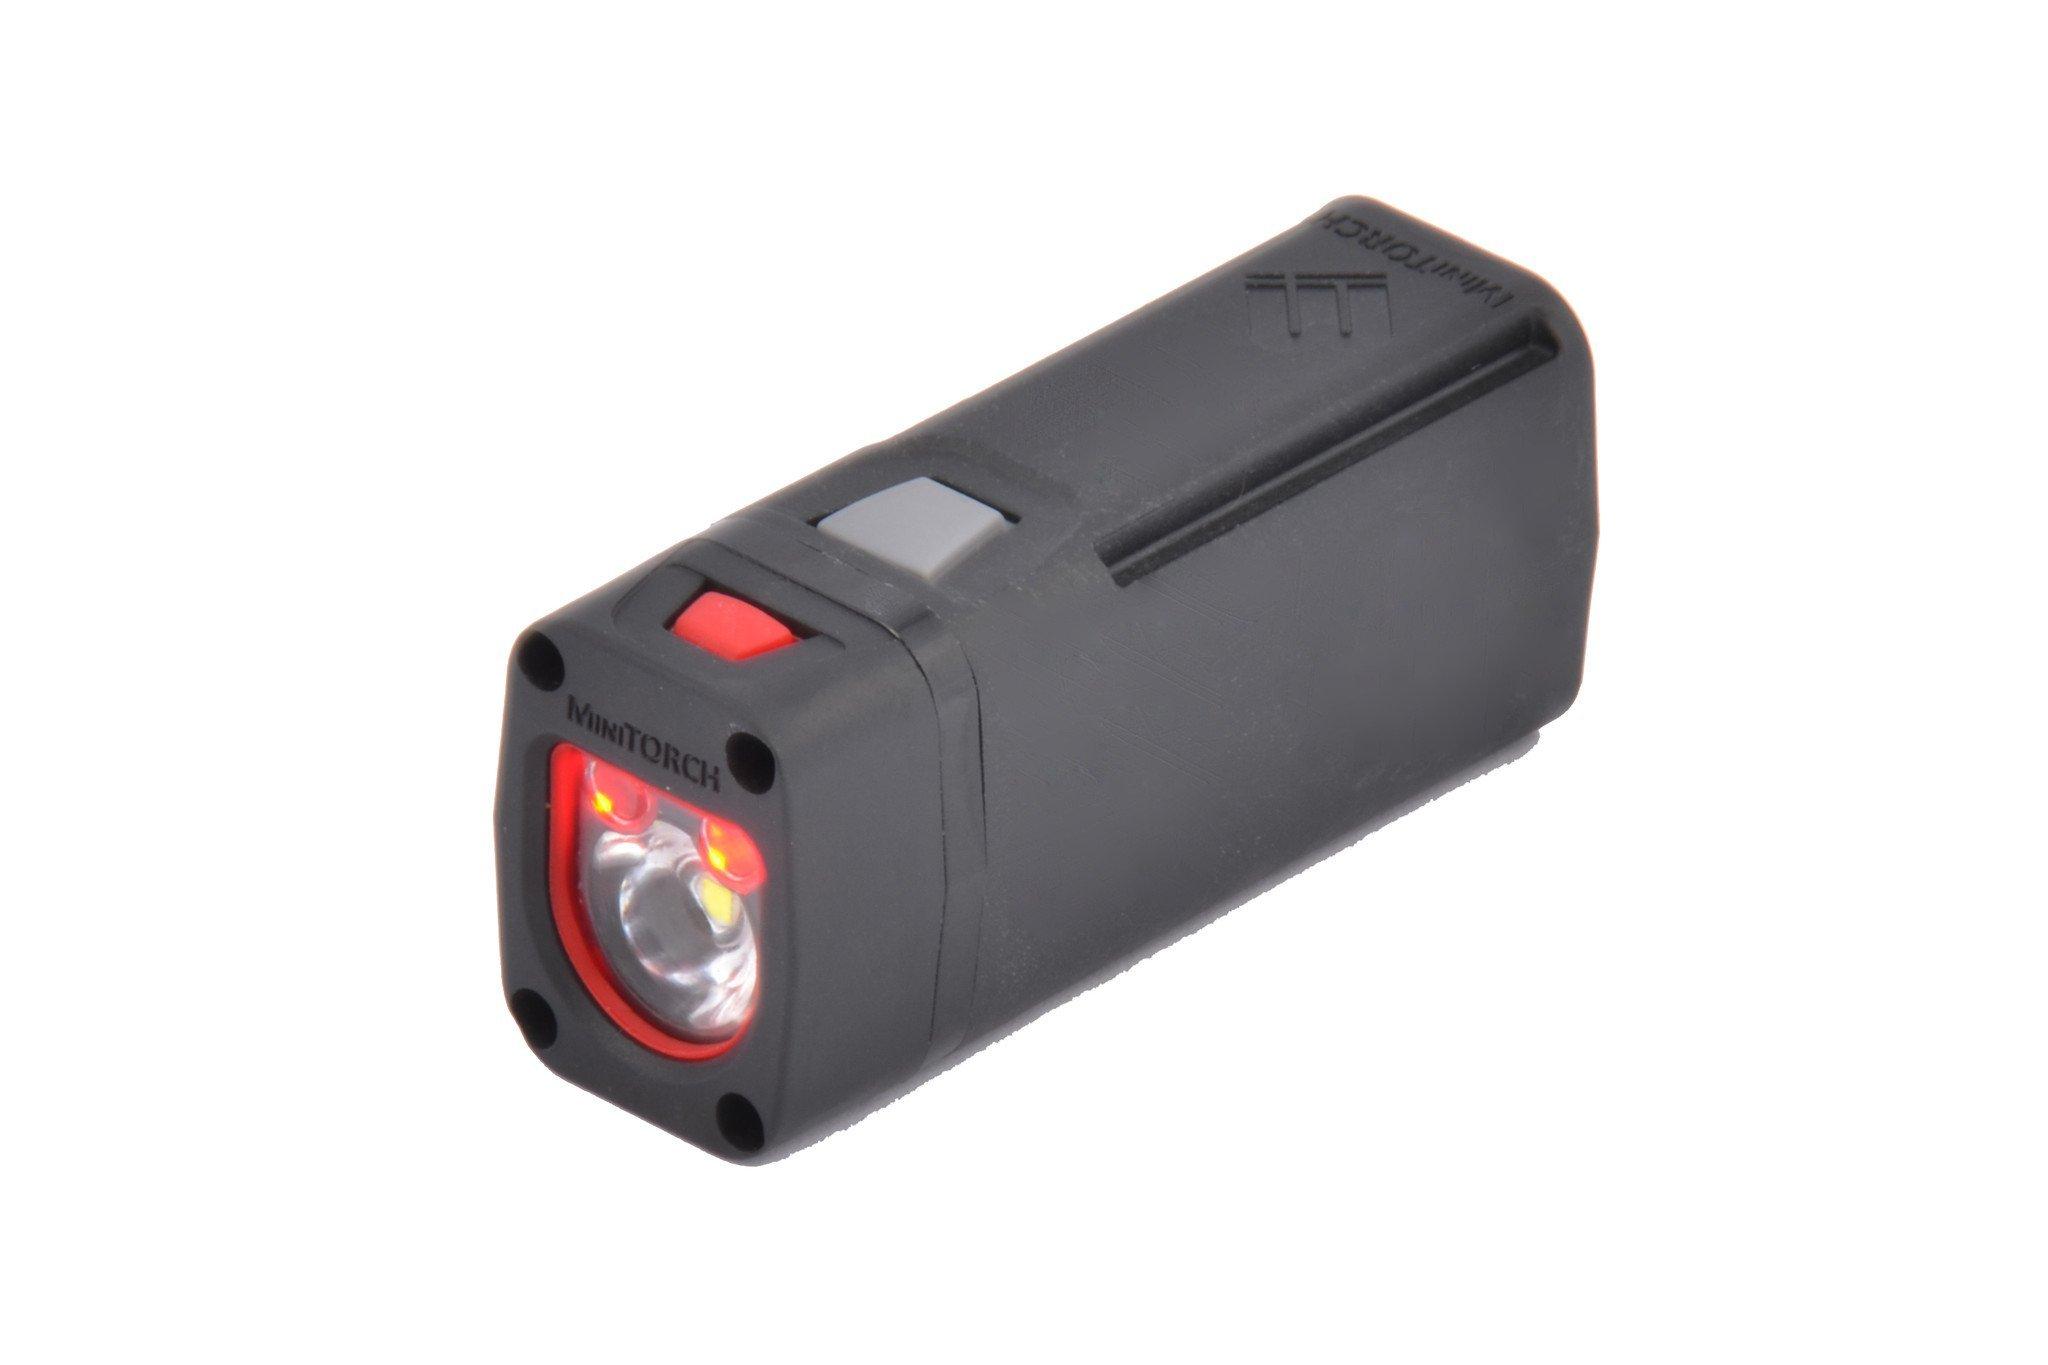 MagnetoSpeed M-Series MiniLIGHT Module with Picatinny Rail Adapter, Black